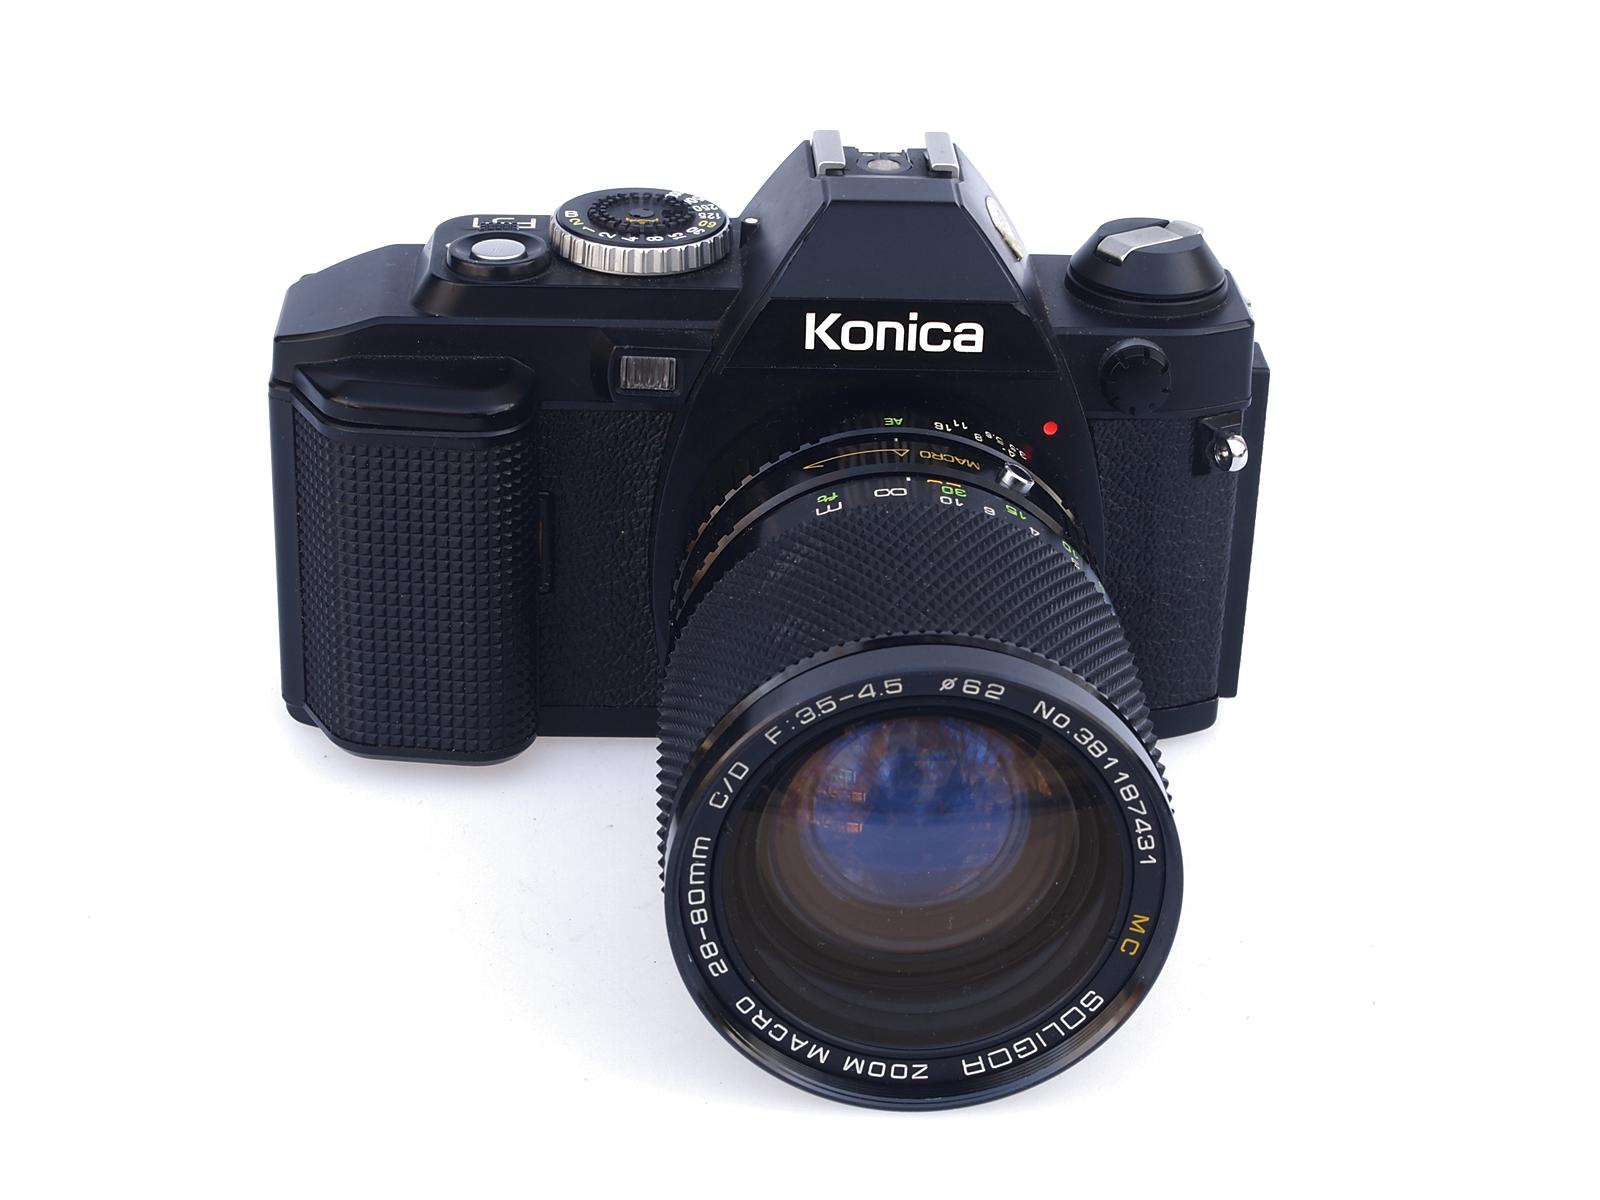 Konica FS-1 (Japan, 1979)